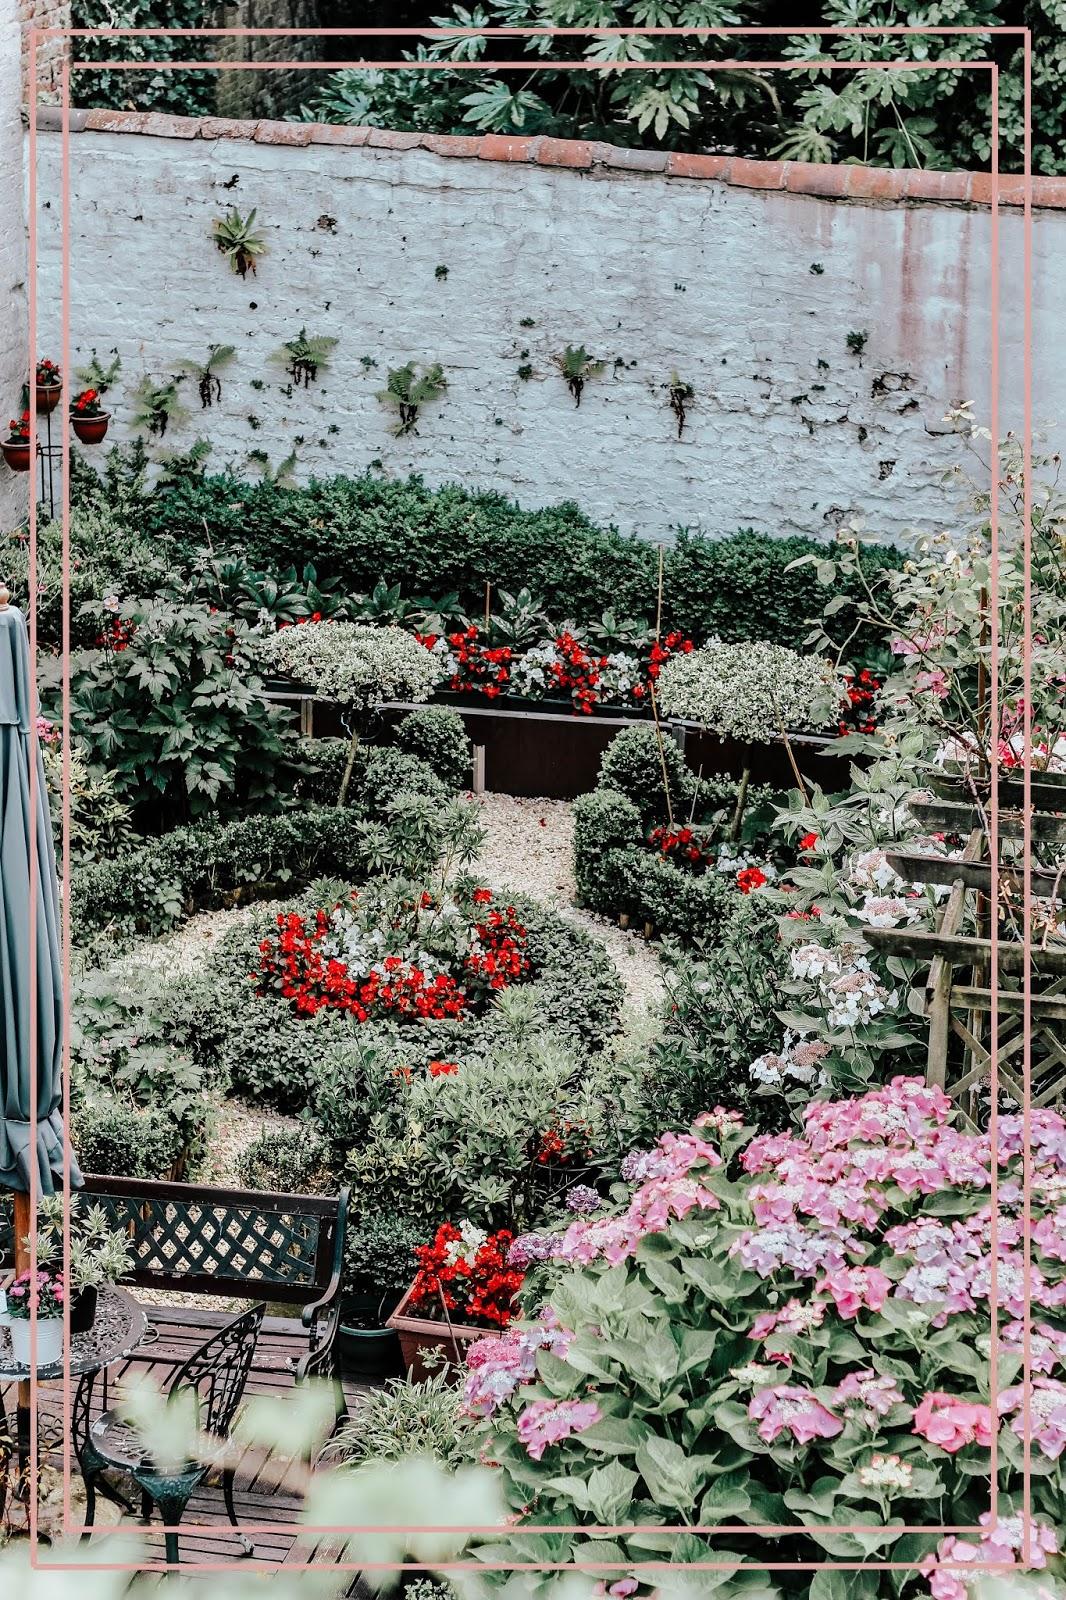 Brugge Belgium Pretty Walled Garden